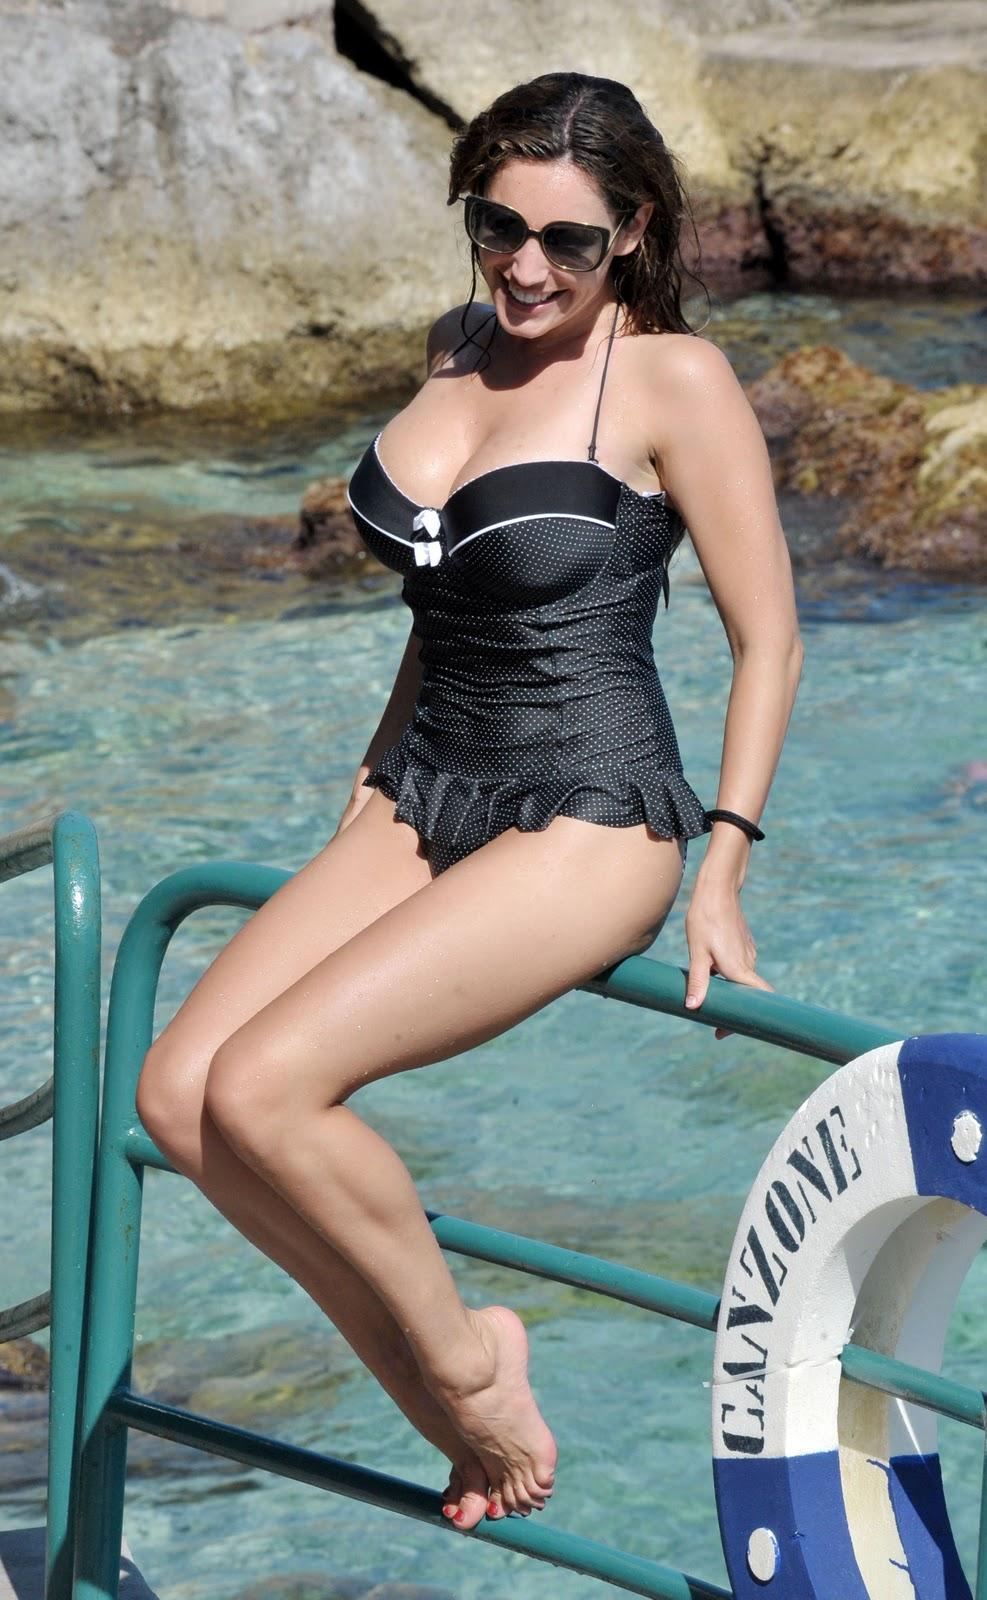 Amanda seyfried dating 2010 dodge 6